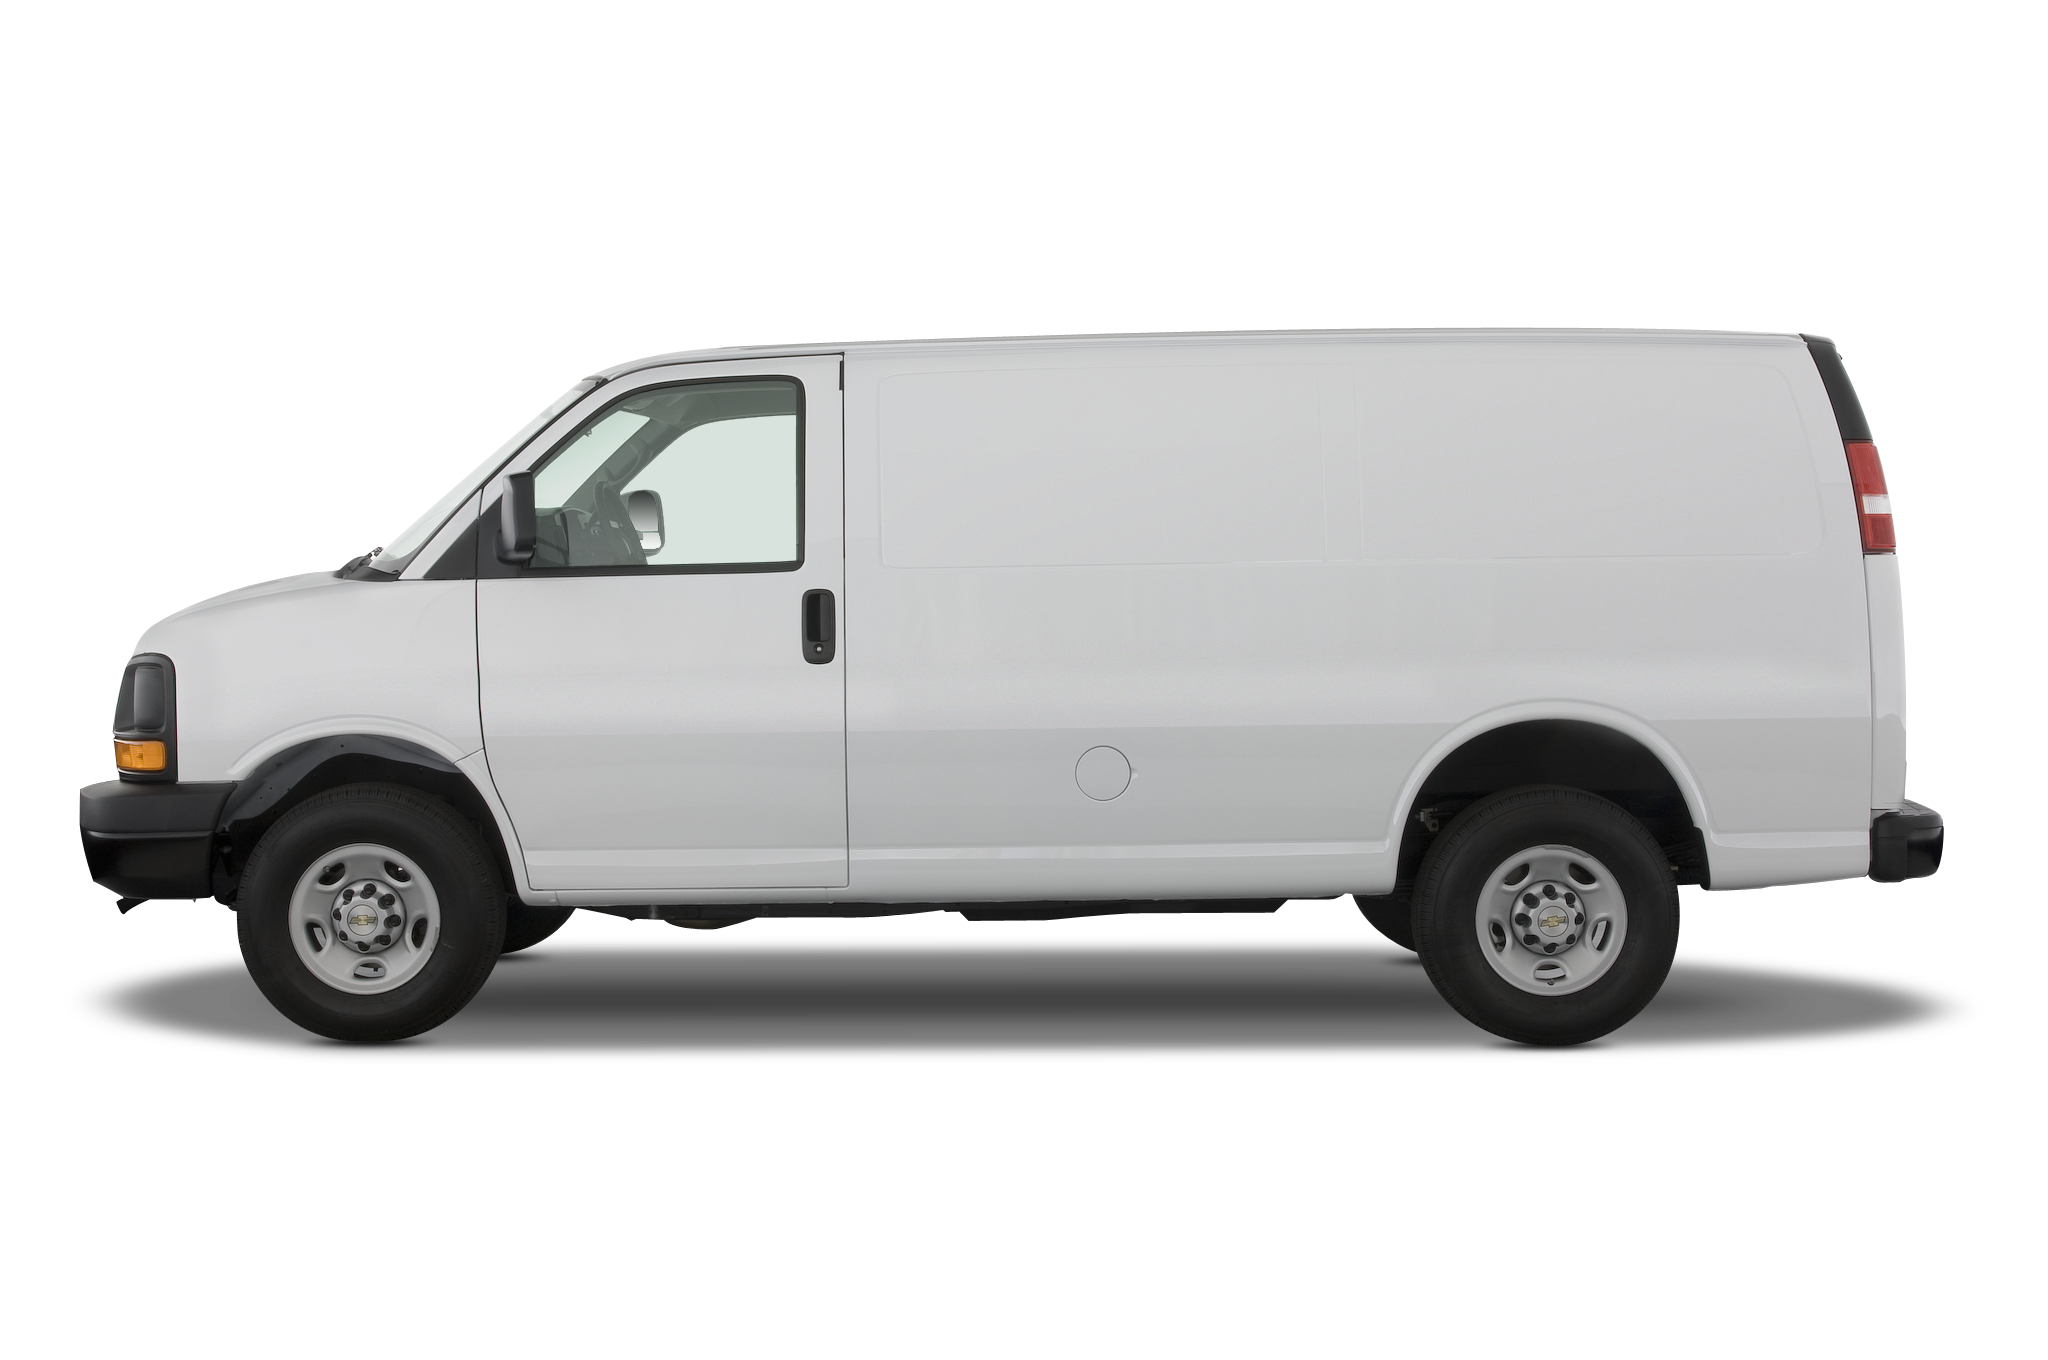 Minivan clipart work van. Black and white png